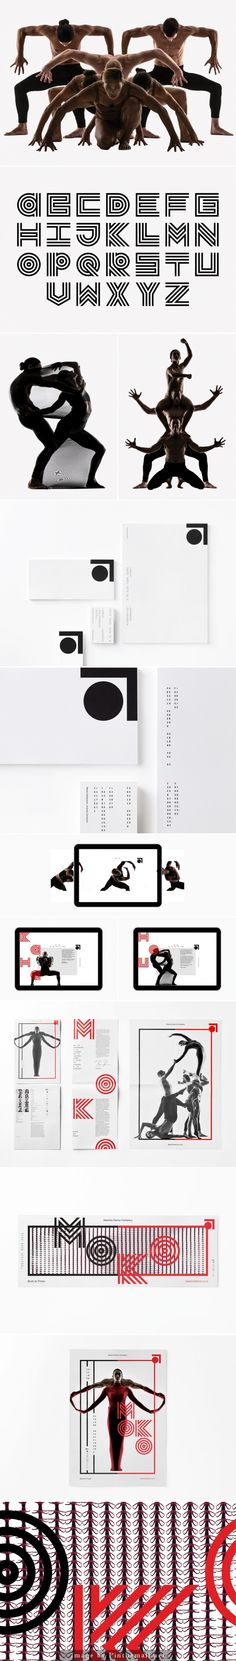 Saatchi & Saatchi Design Worldwide. Atamira Dance Company